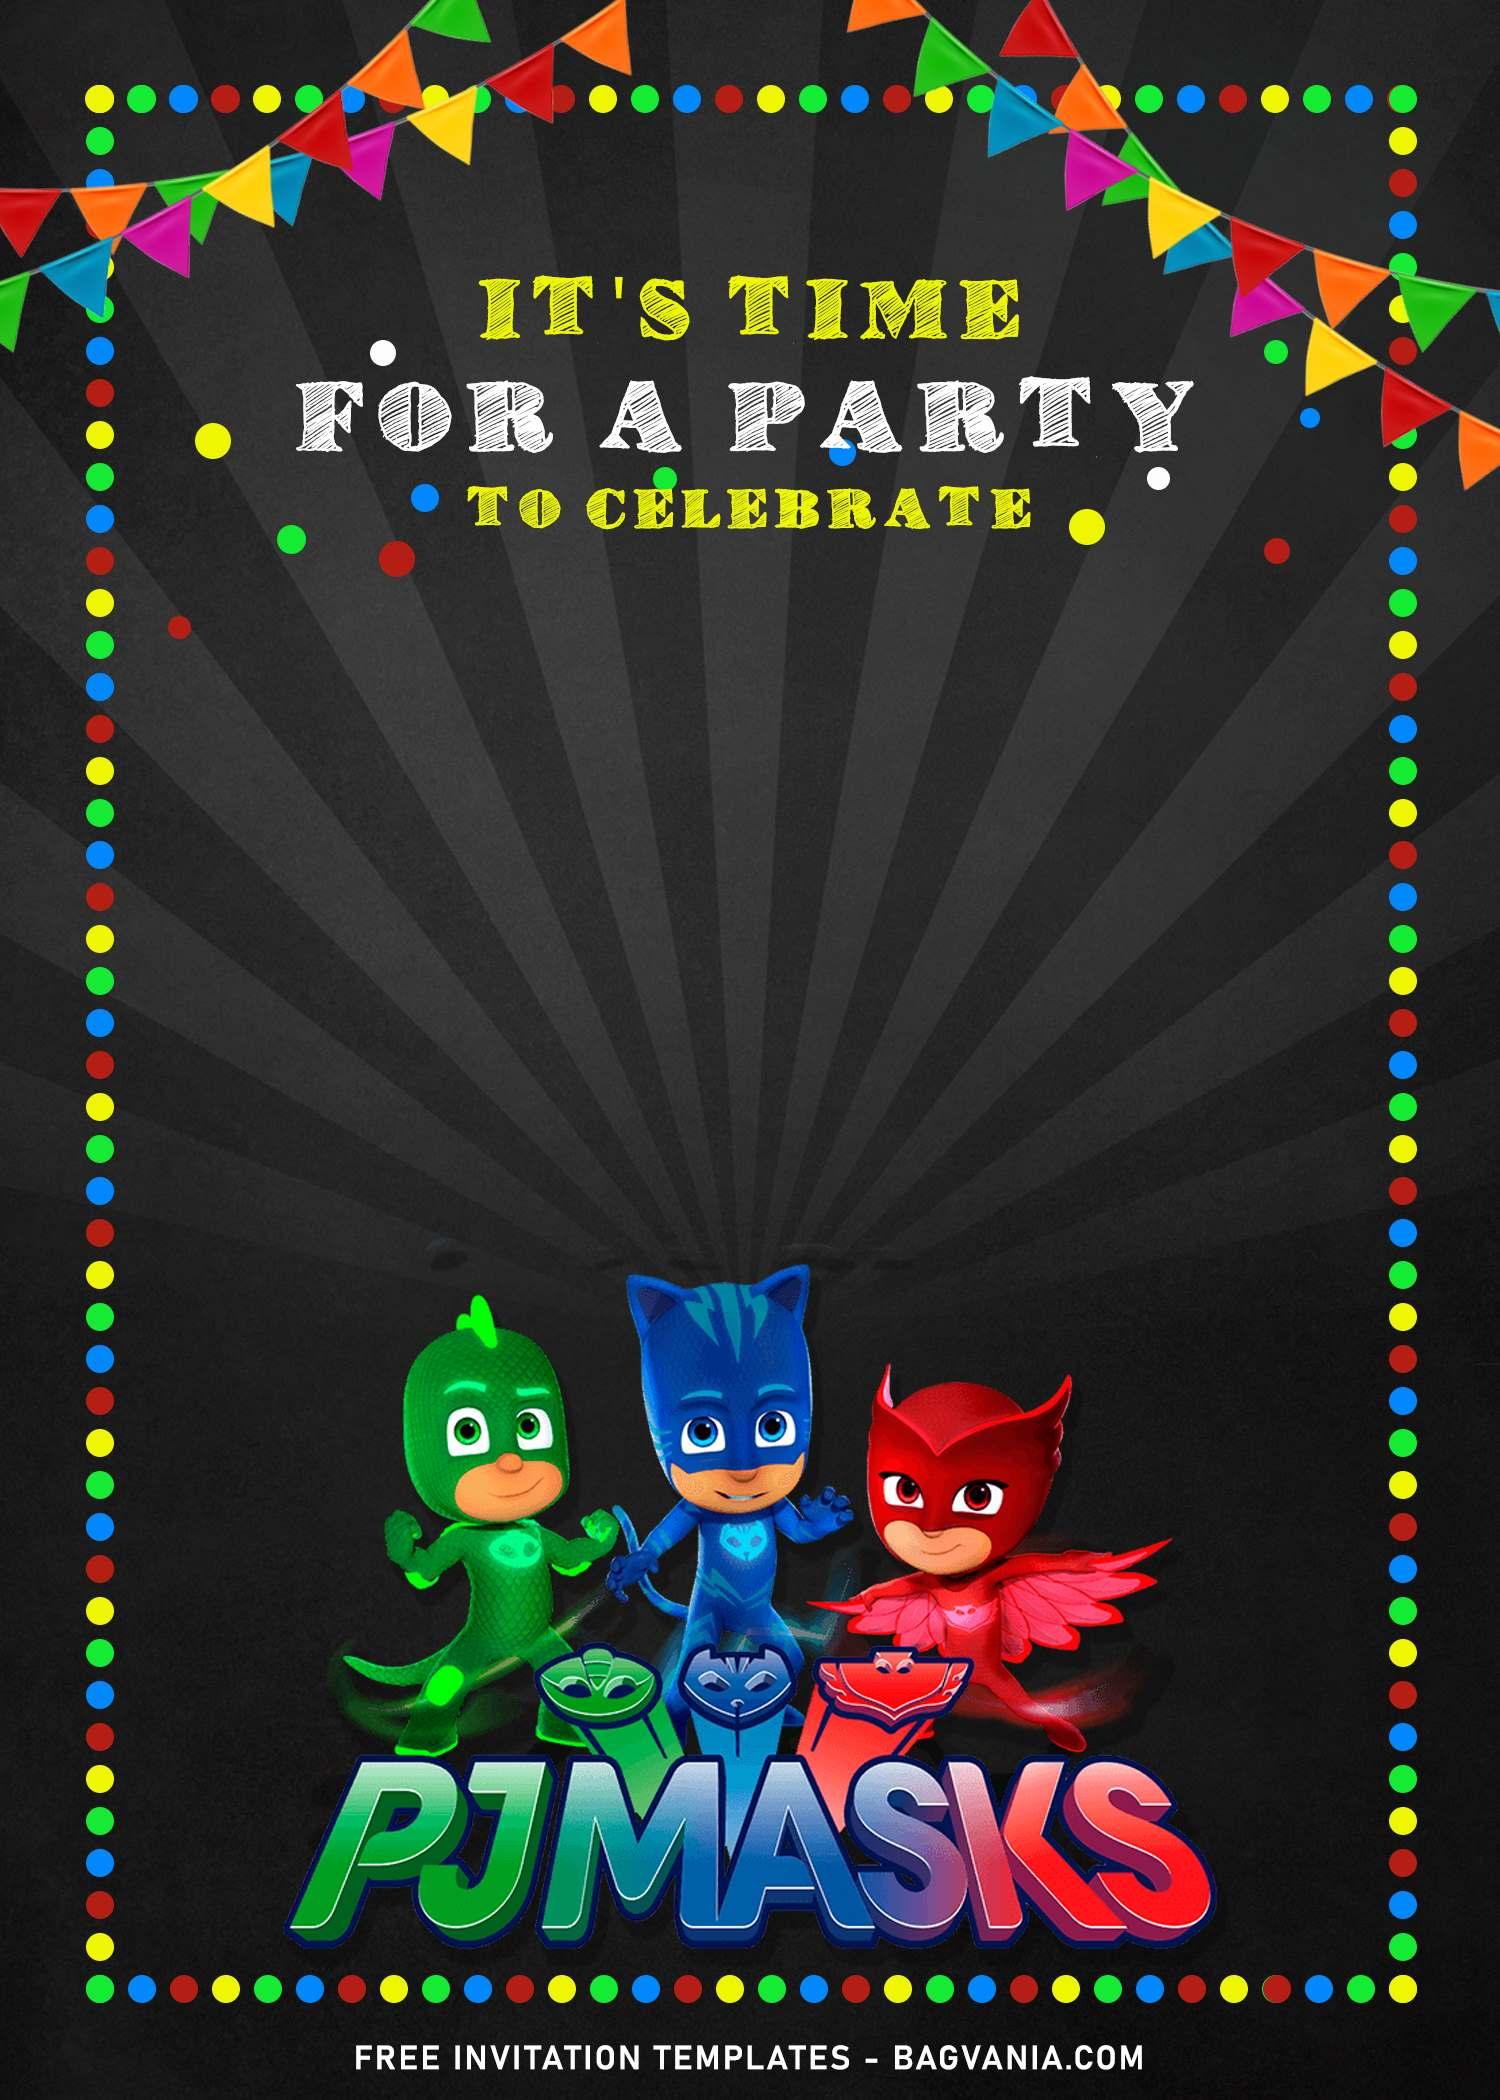 10 Gecko Owlette Catboy Pj Masks Birthday Invitation Templates Free Printable Birthday Invitation Templates Bagvania